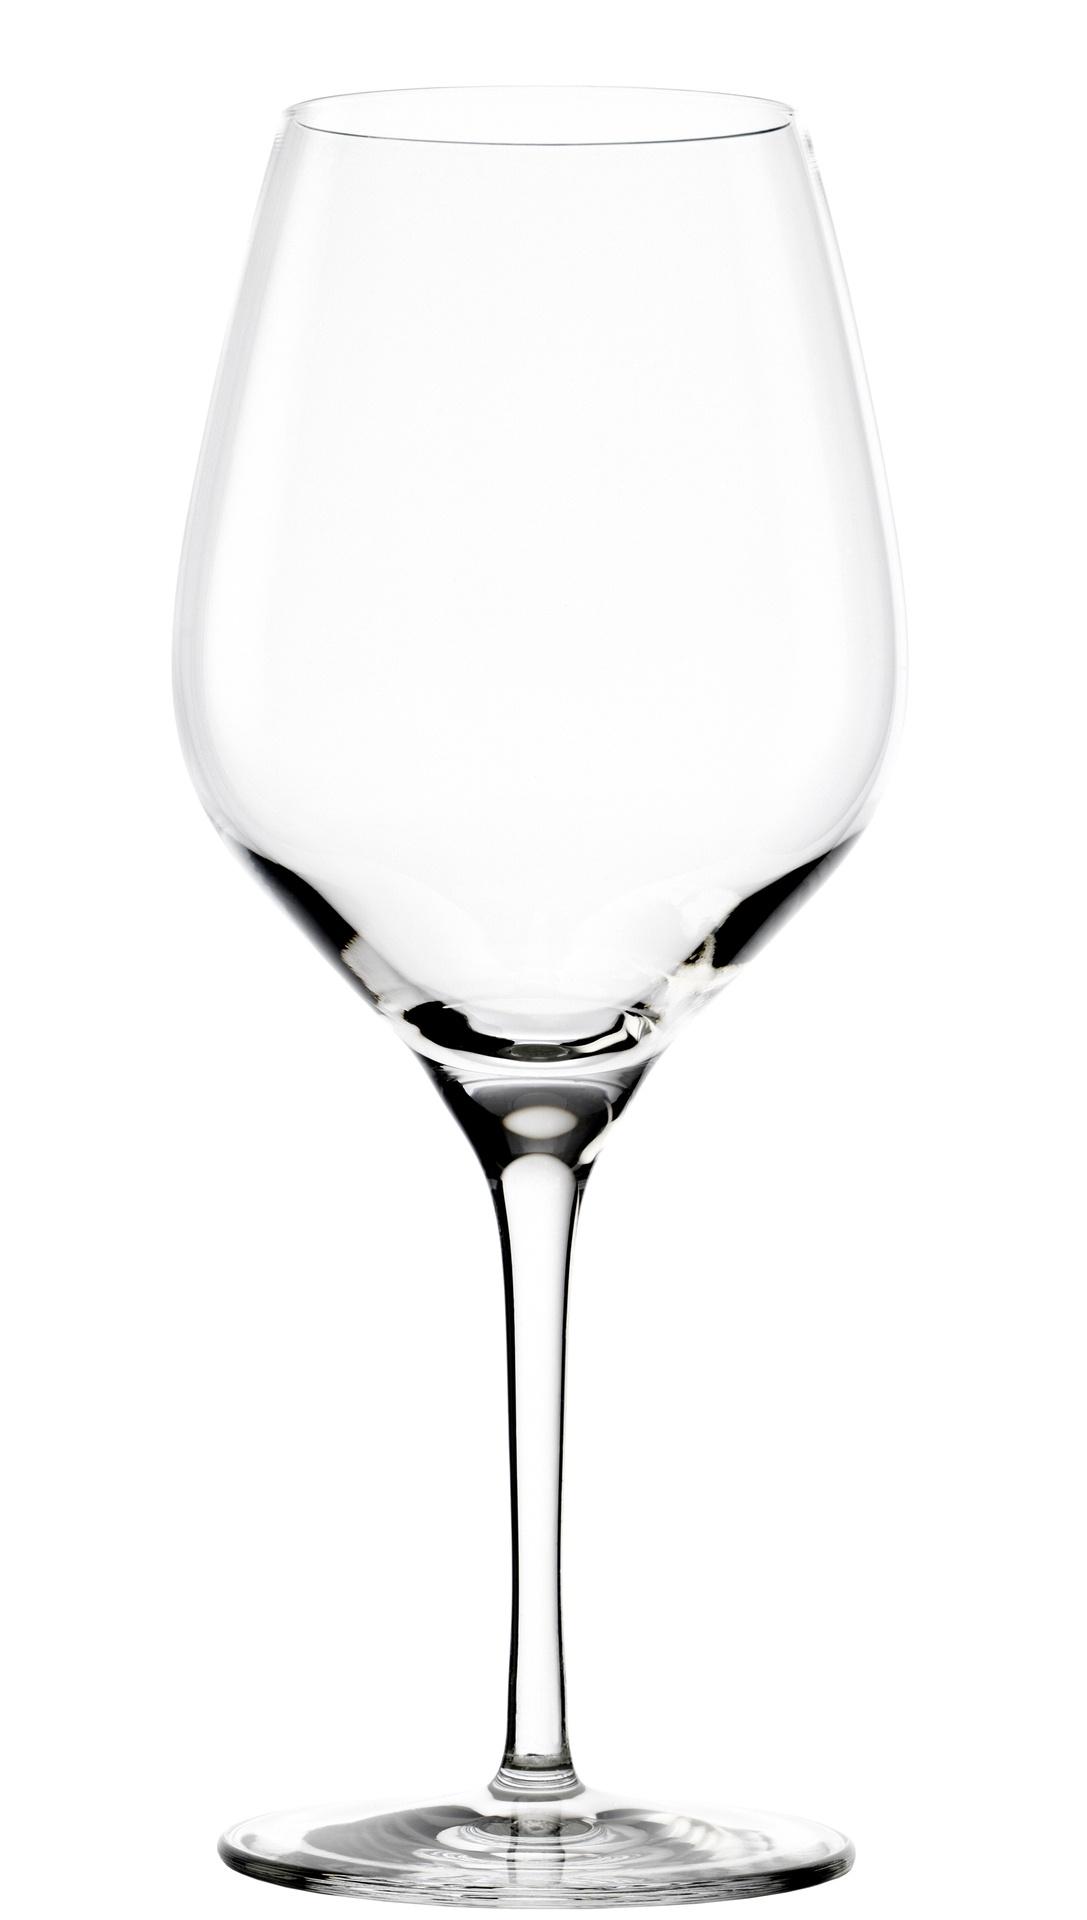 1087x1920 Stolzle Exquisit Red Wine Glass 480ml Set6